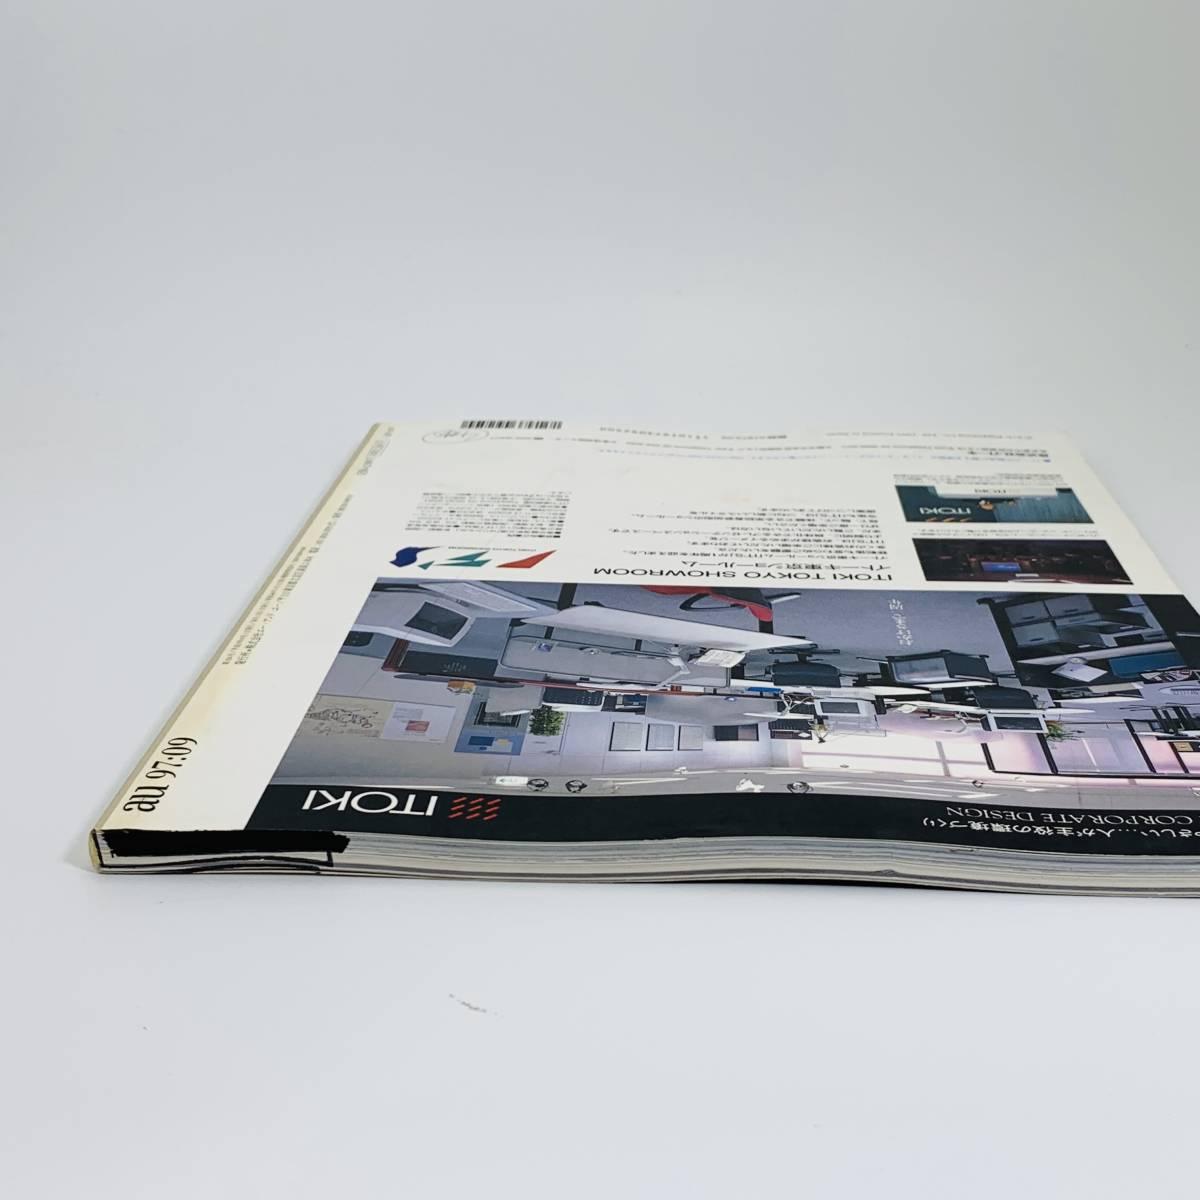 a+u建築と都市 97:09 特集アリス・アンド・モリソン バーナード・チュミ/グルーゼン・サムトン/レム・コールハース/OMA 1997年9月号_画像2